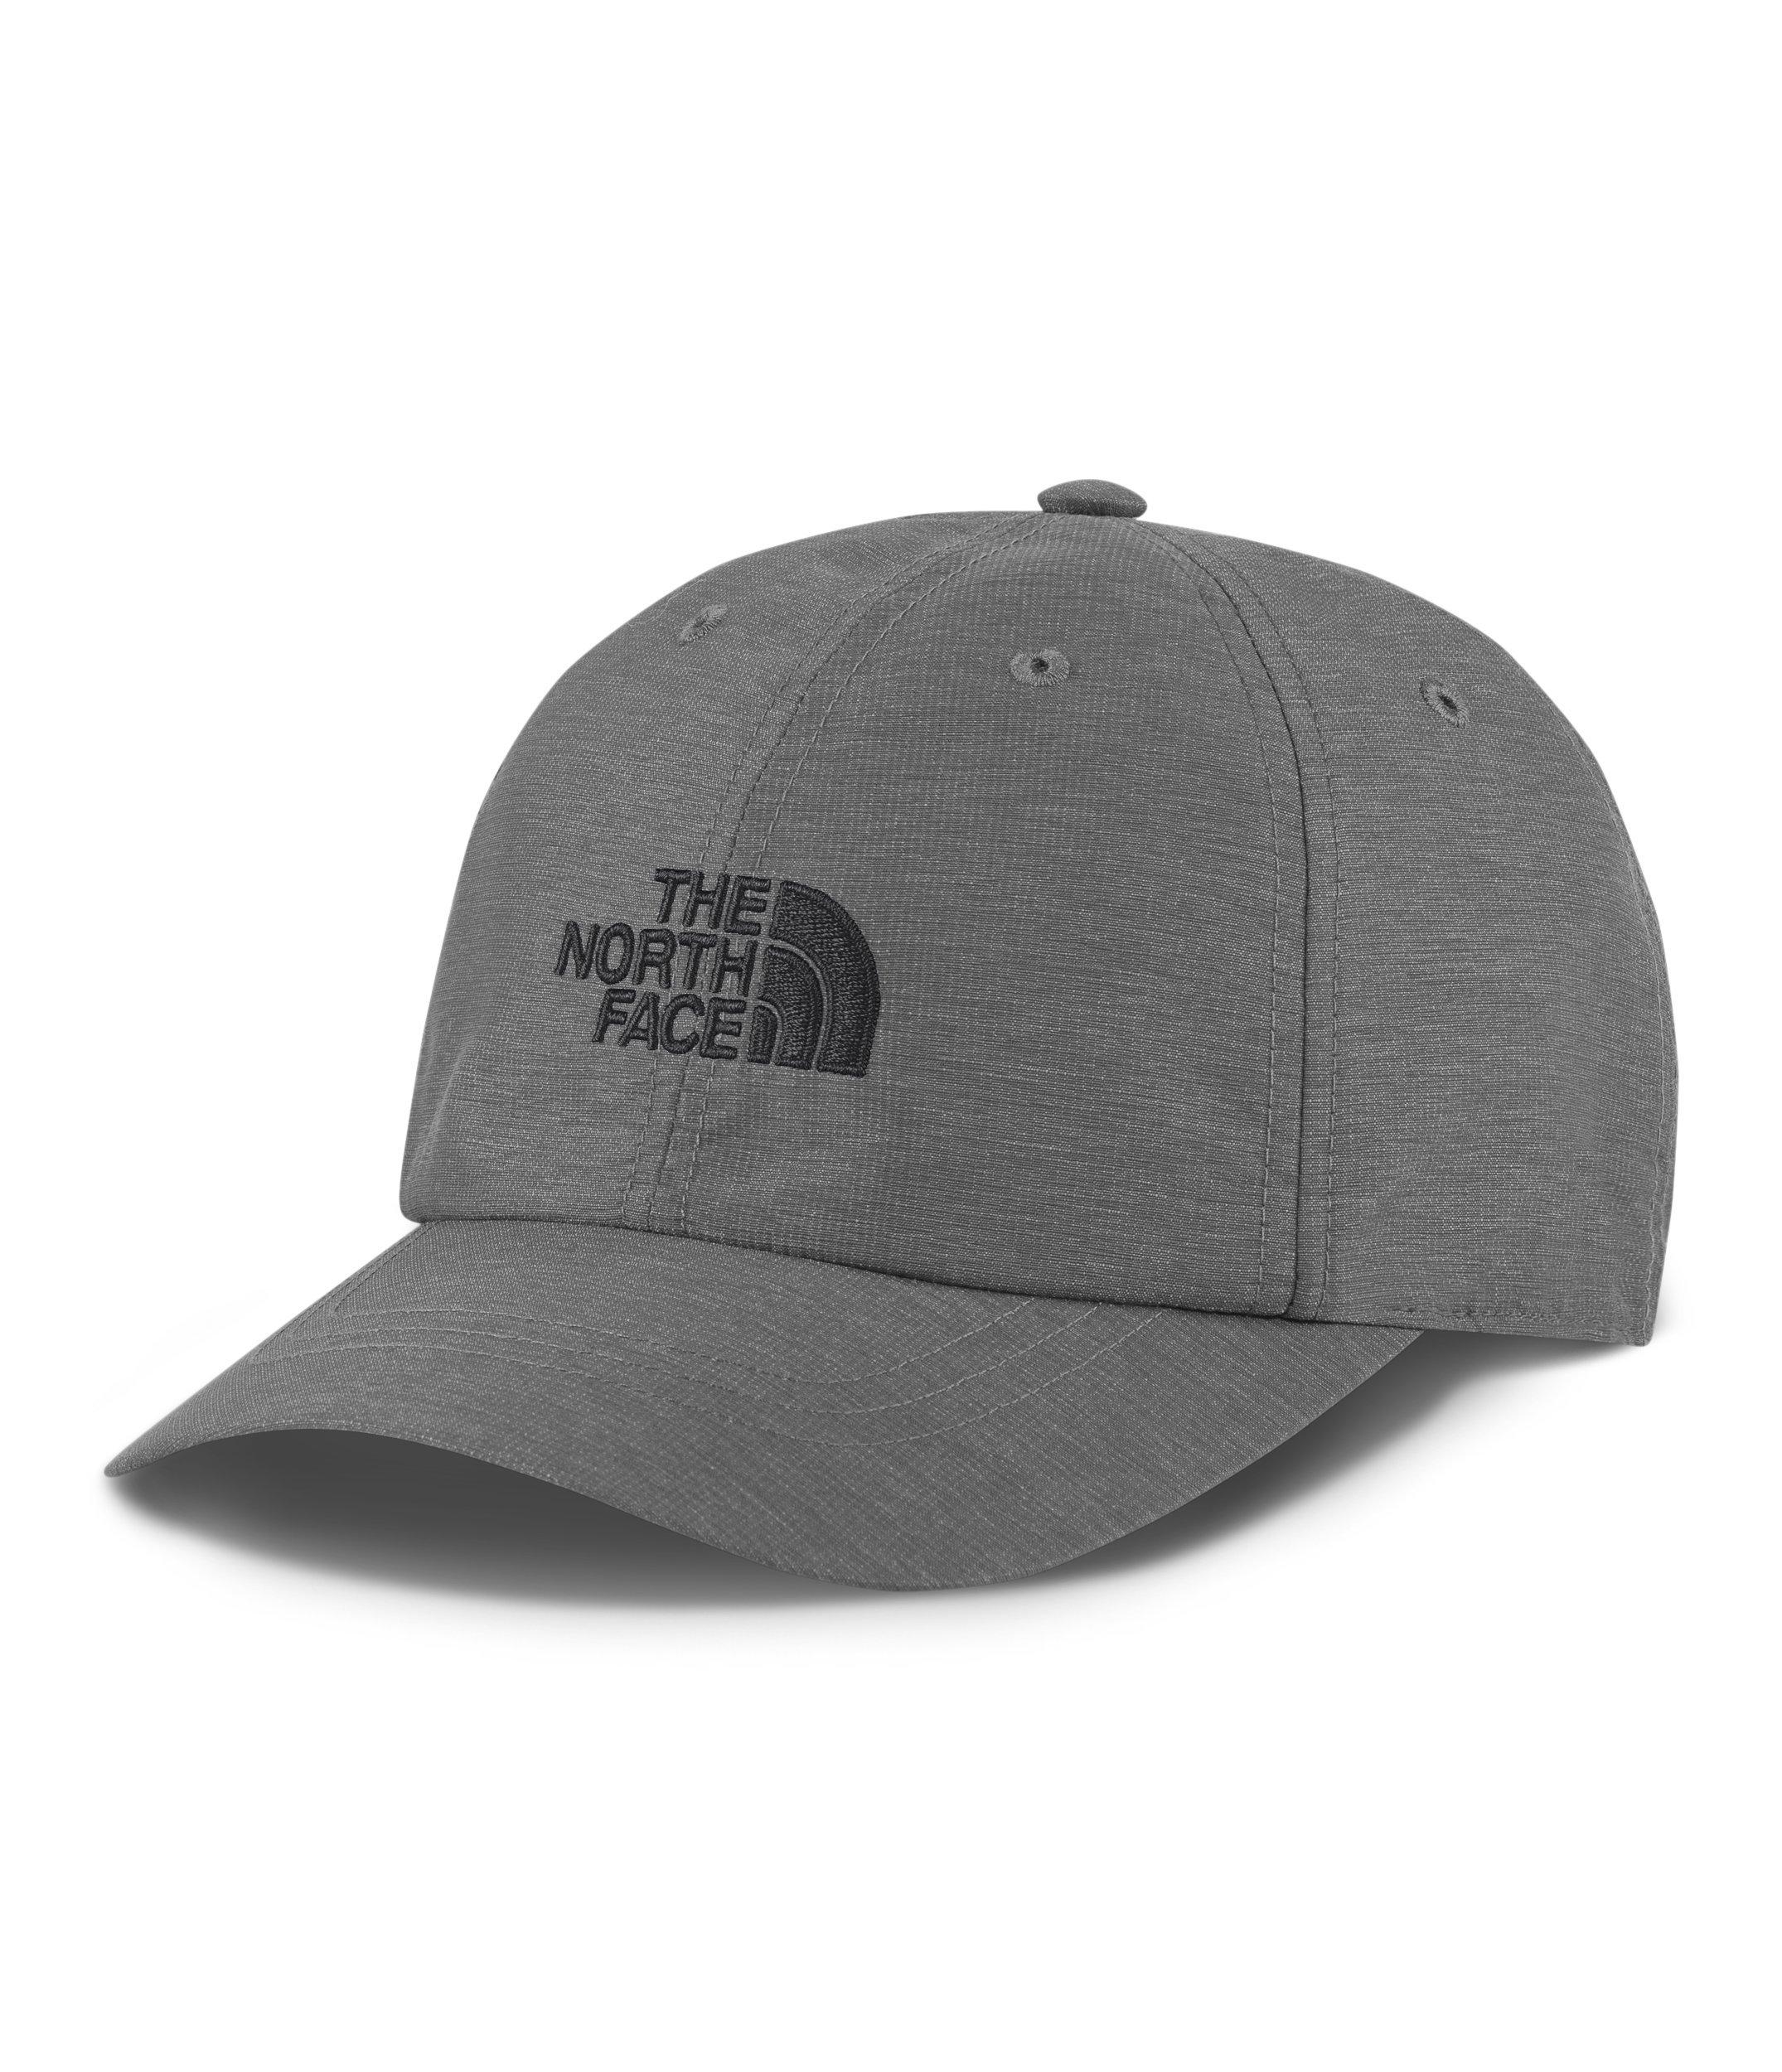 3d10f87559c Galleon - The North Face Unisex Horizon Ball Cap TNF Medium Grey Heather/Asphalt  Grey LG/XL